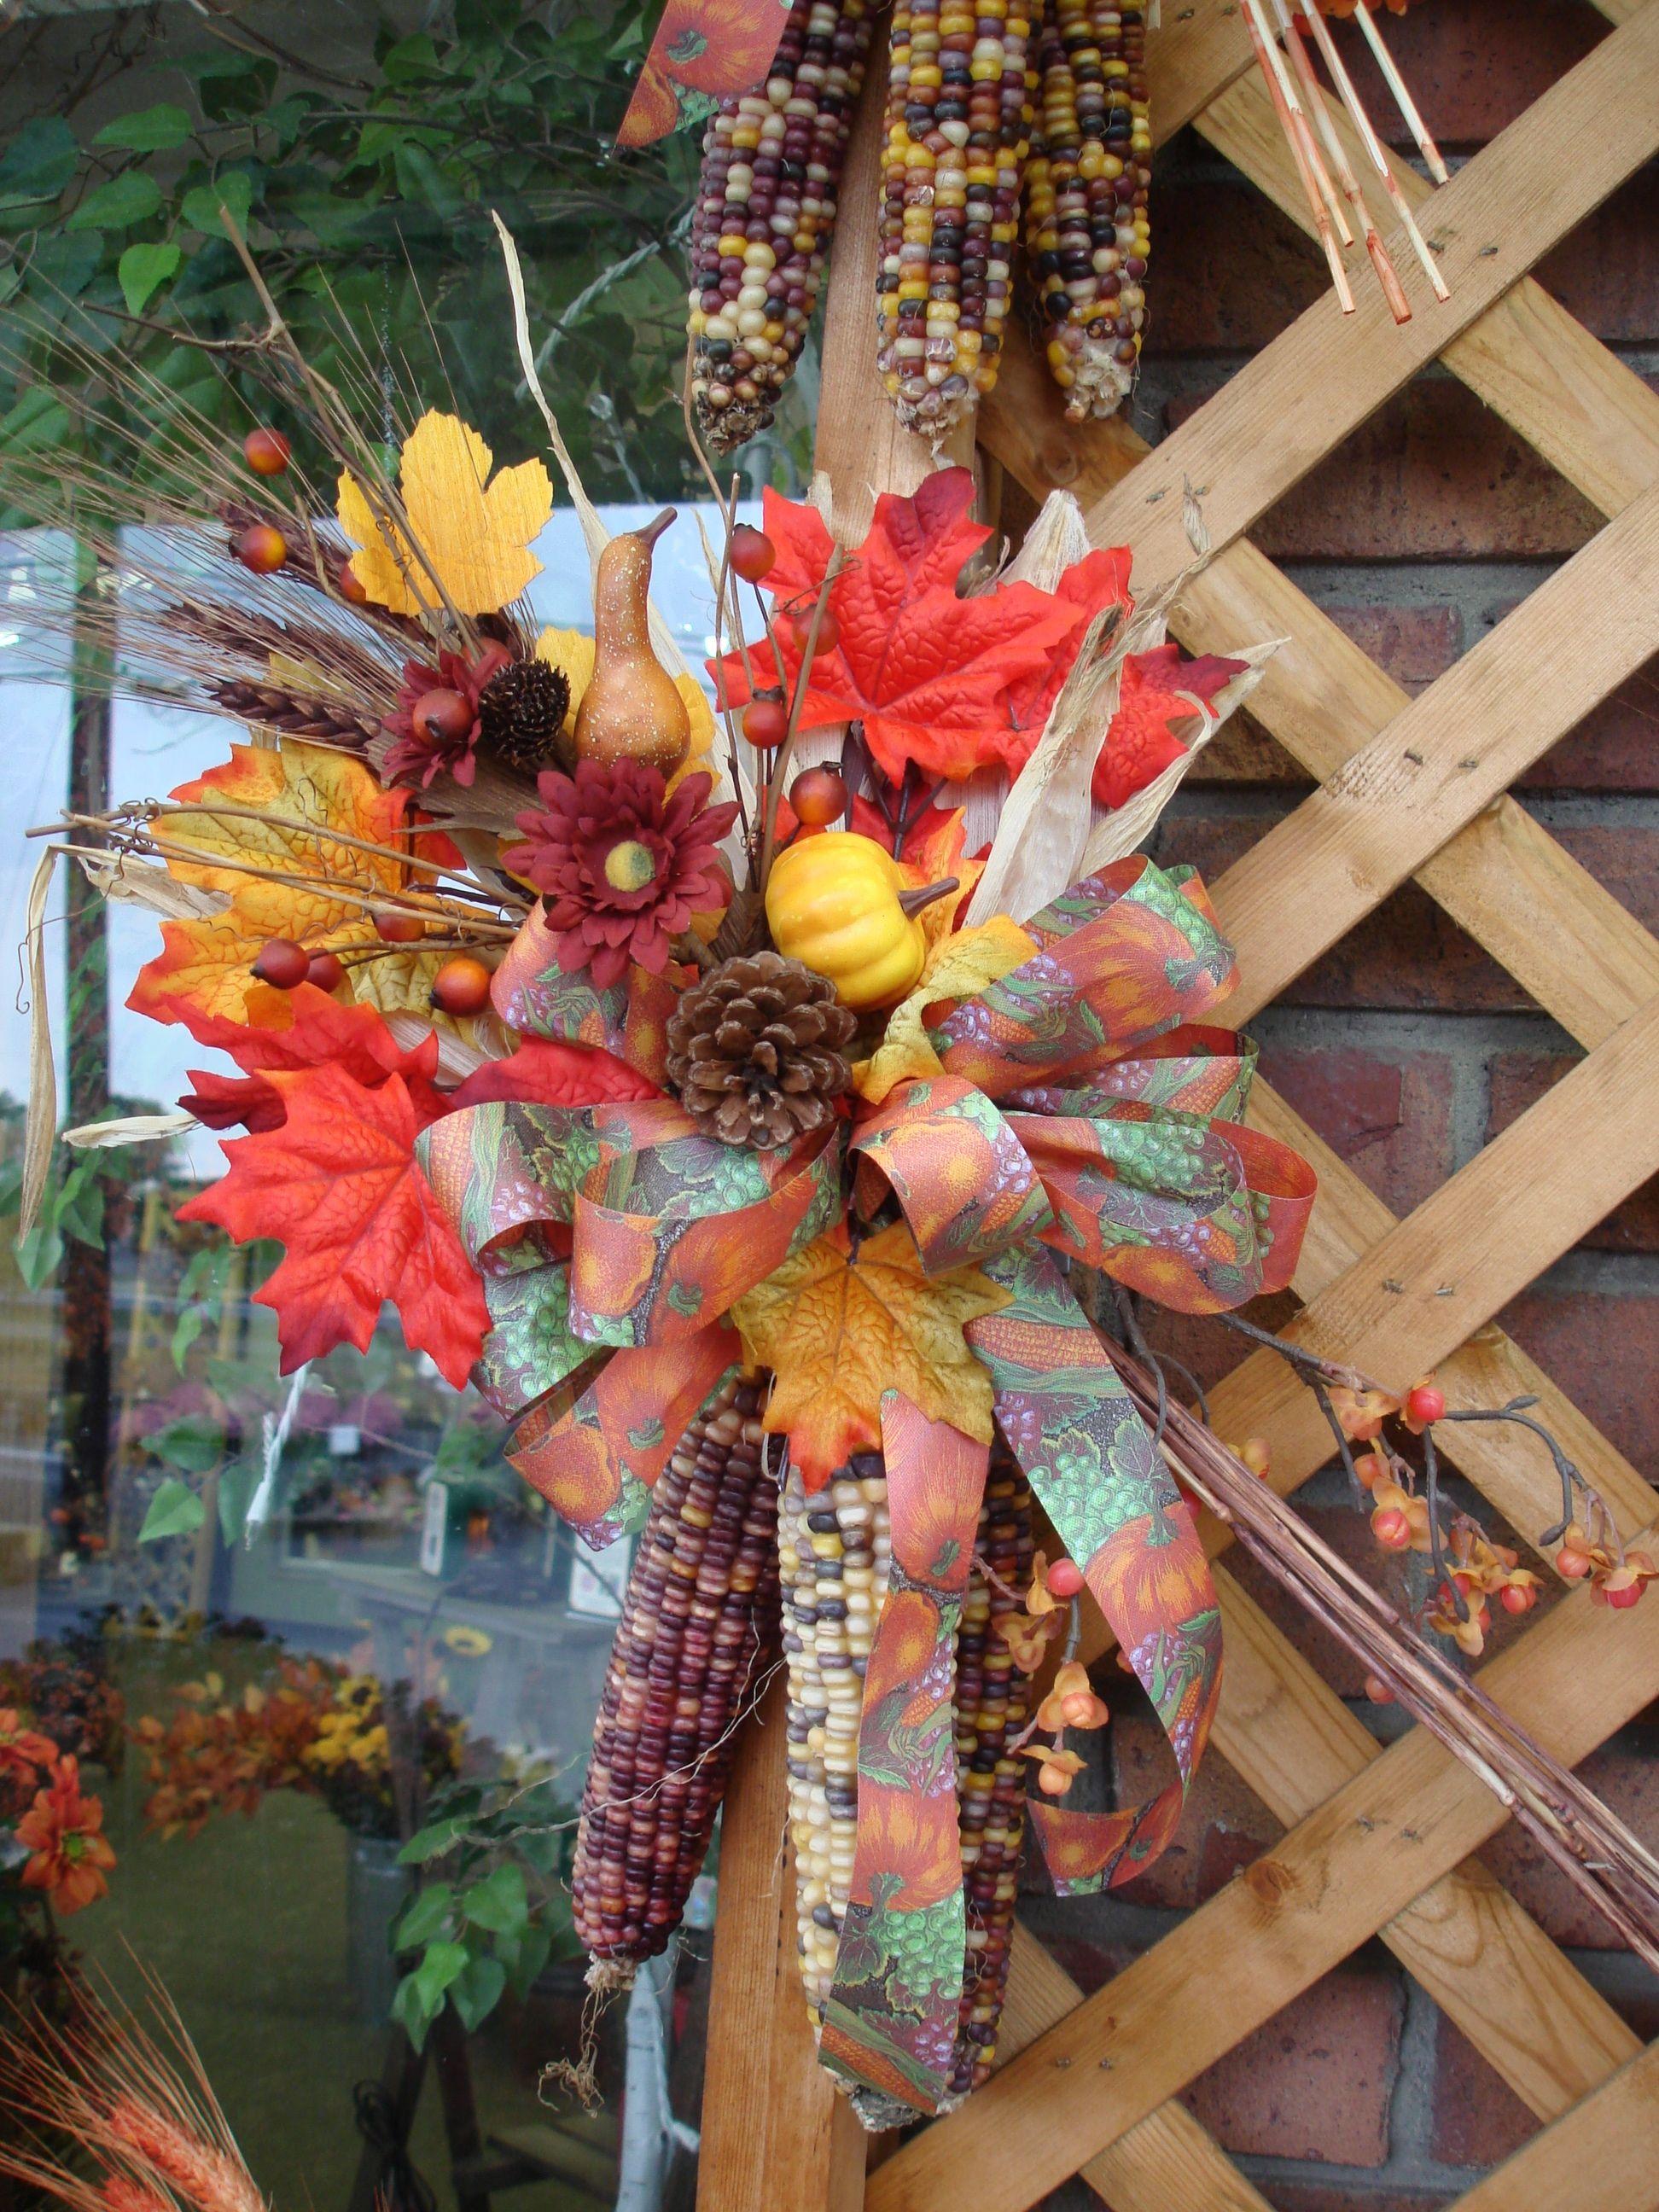 Jackson Florist Indian corn door swag #autumndecor #falldoorswag #indiancorn